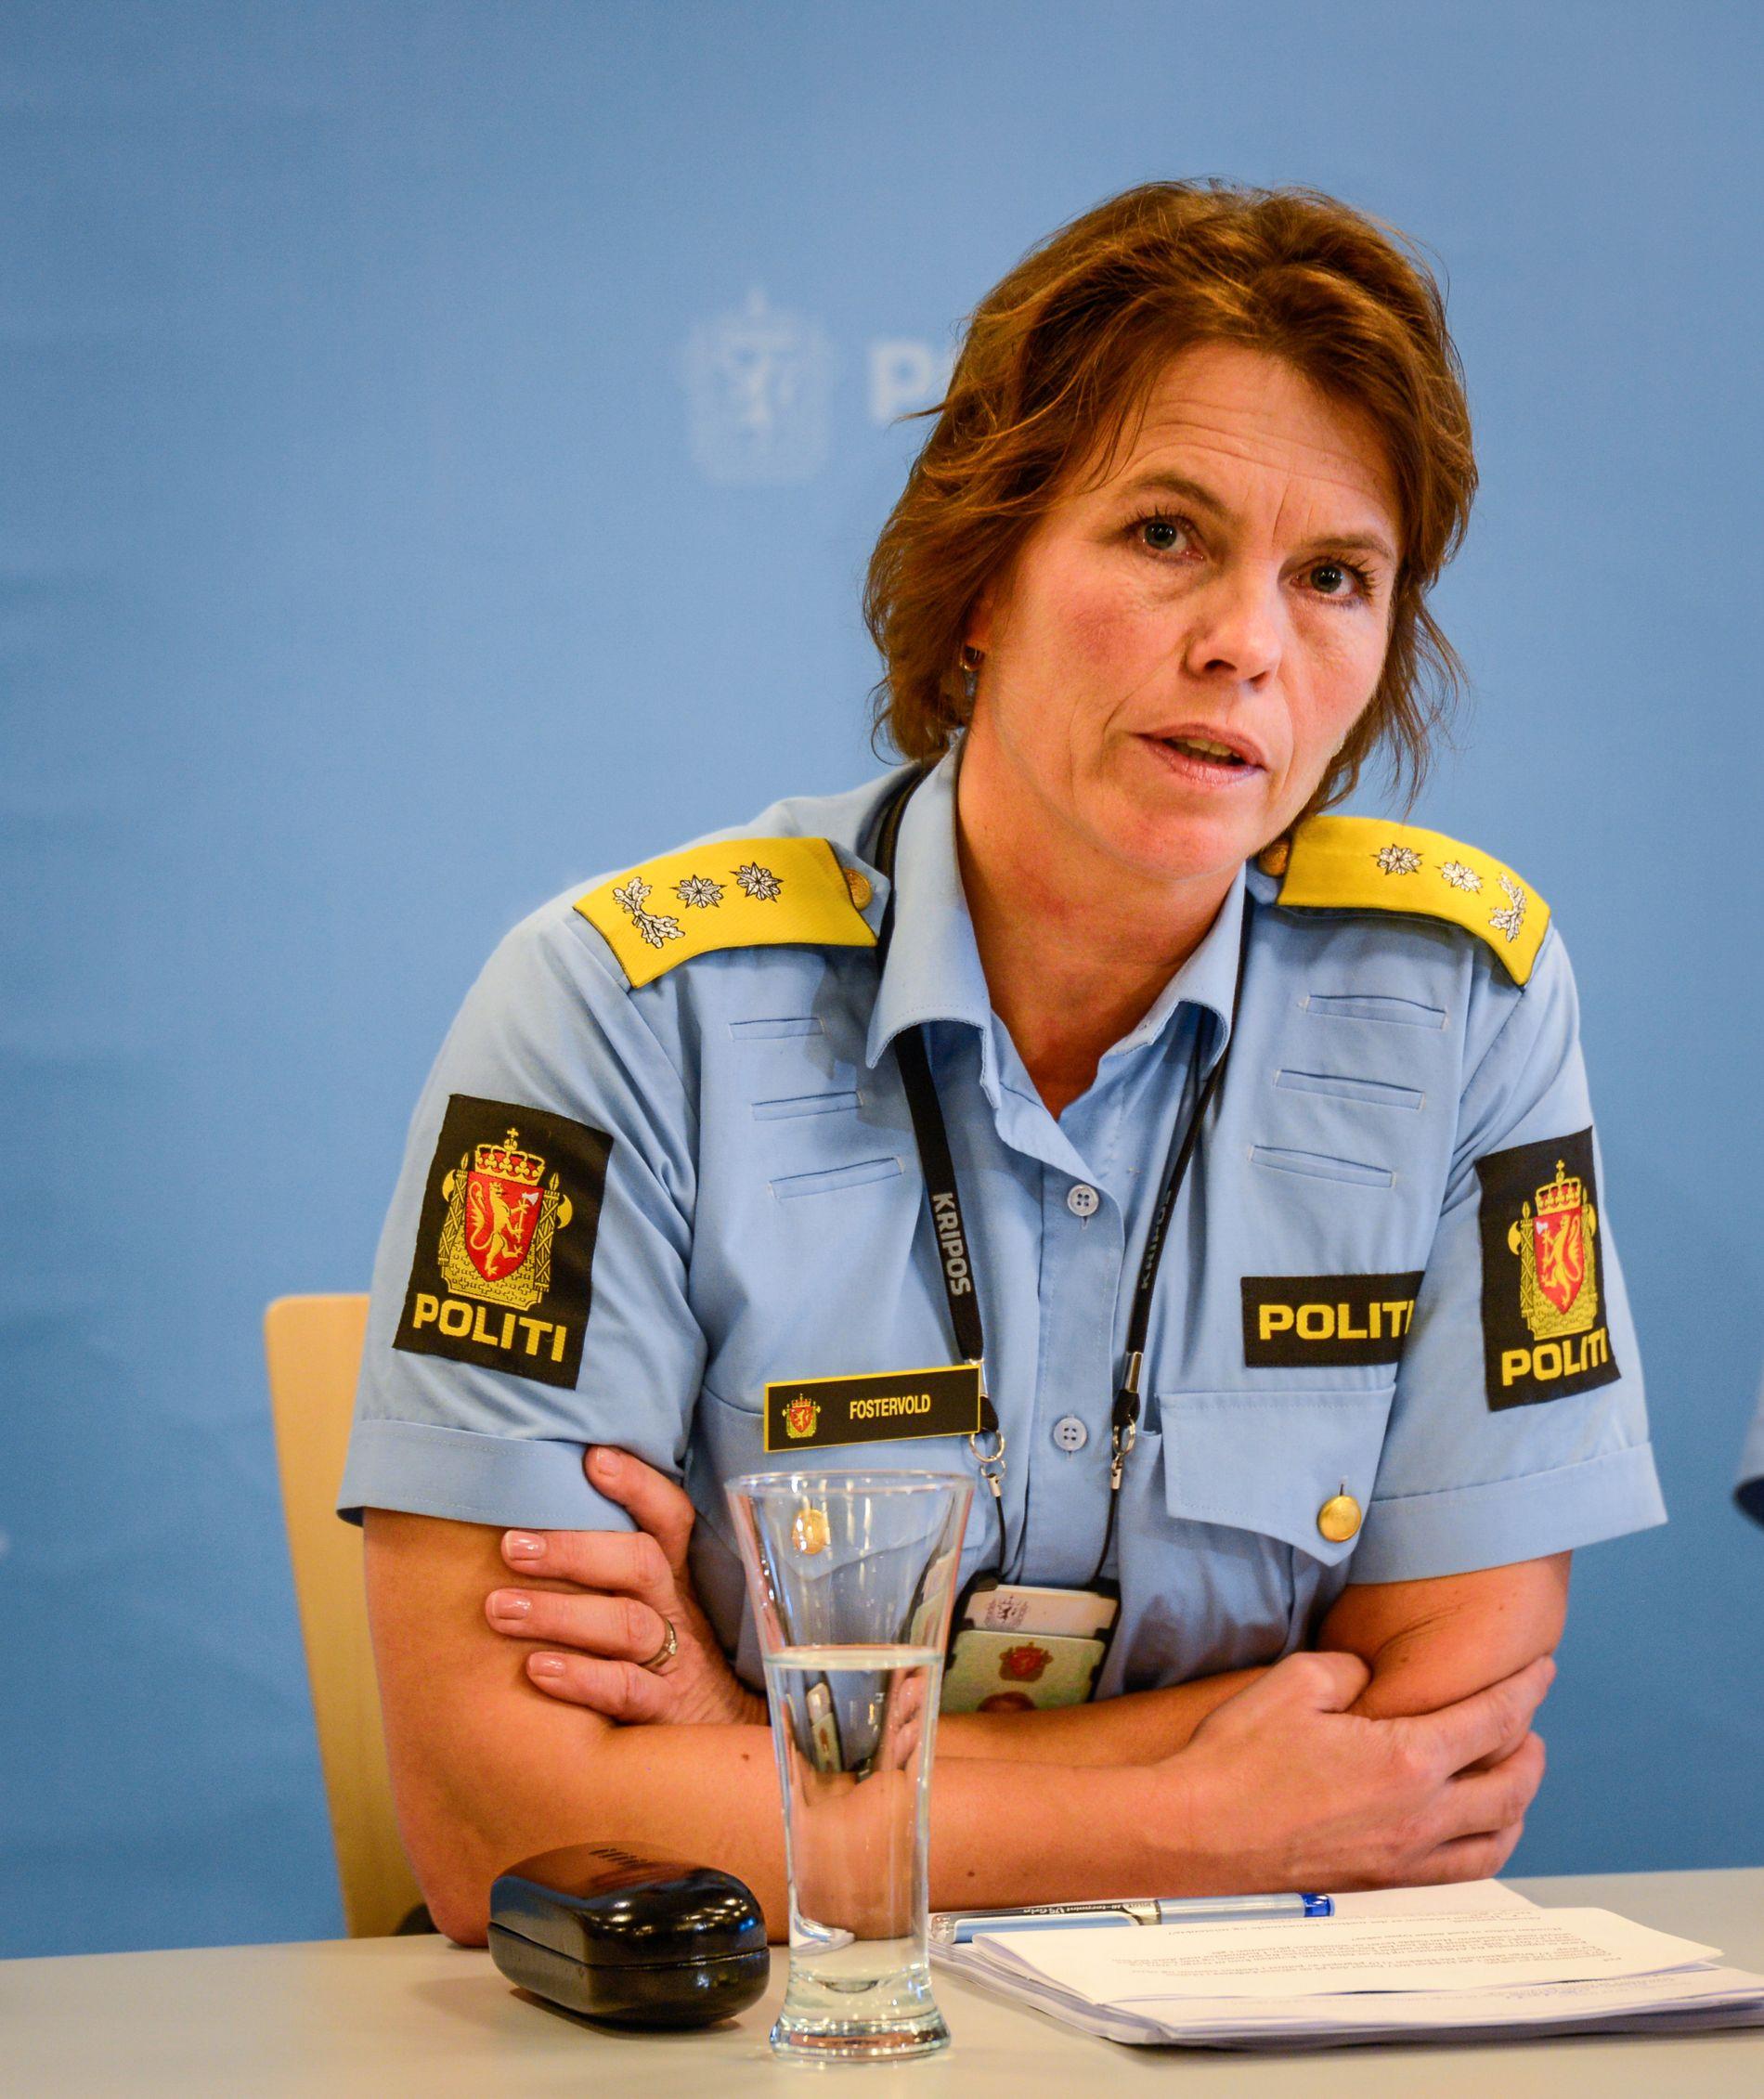 TØFT: Visepolitimester Marit Fostervold i Trøndelag politidistrikt beskriver kurset som hardt.